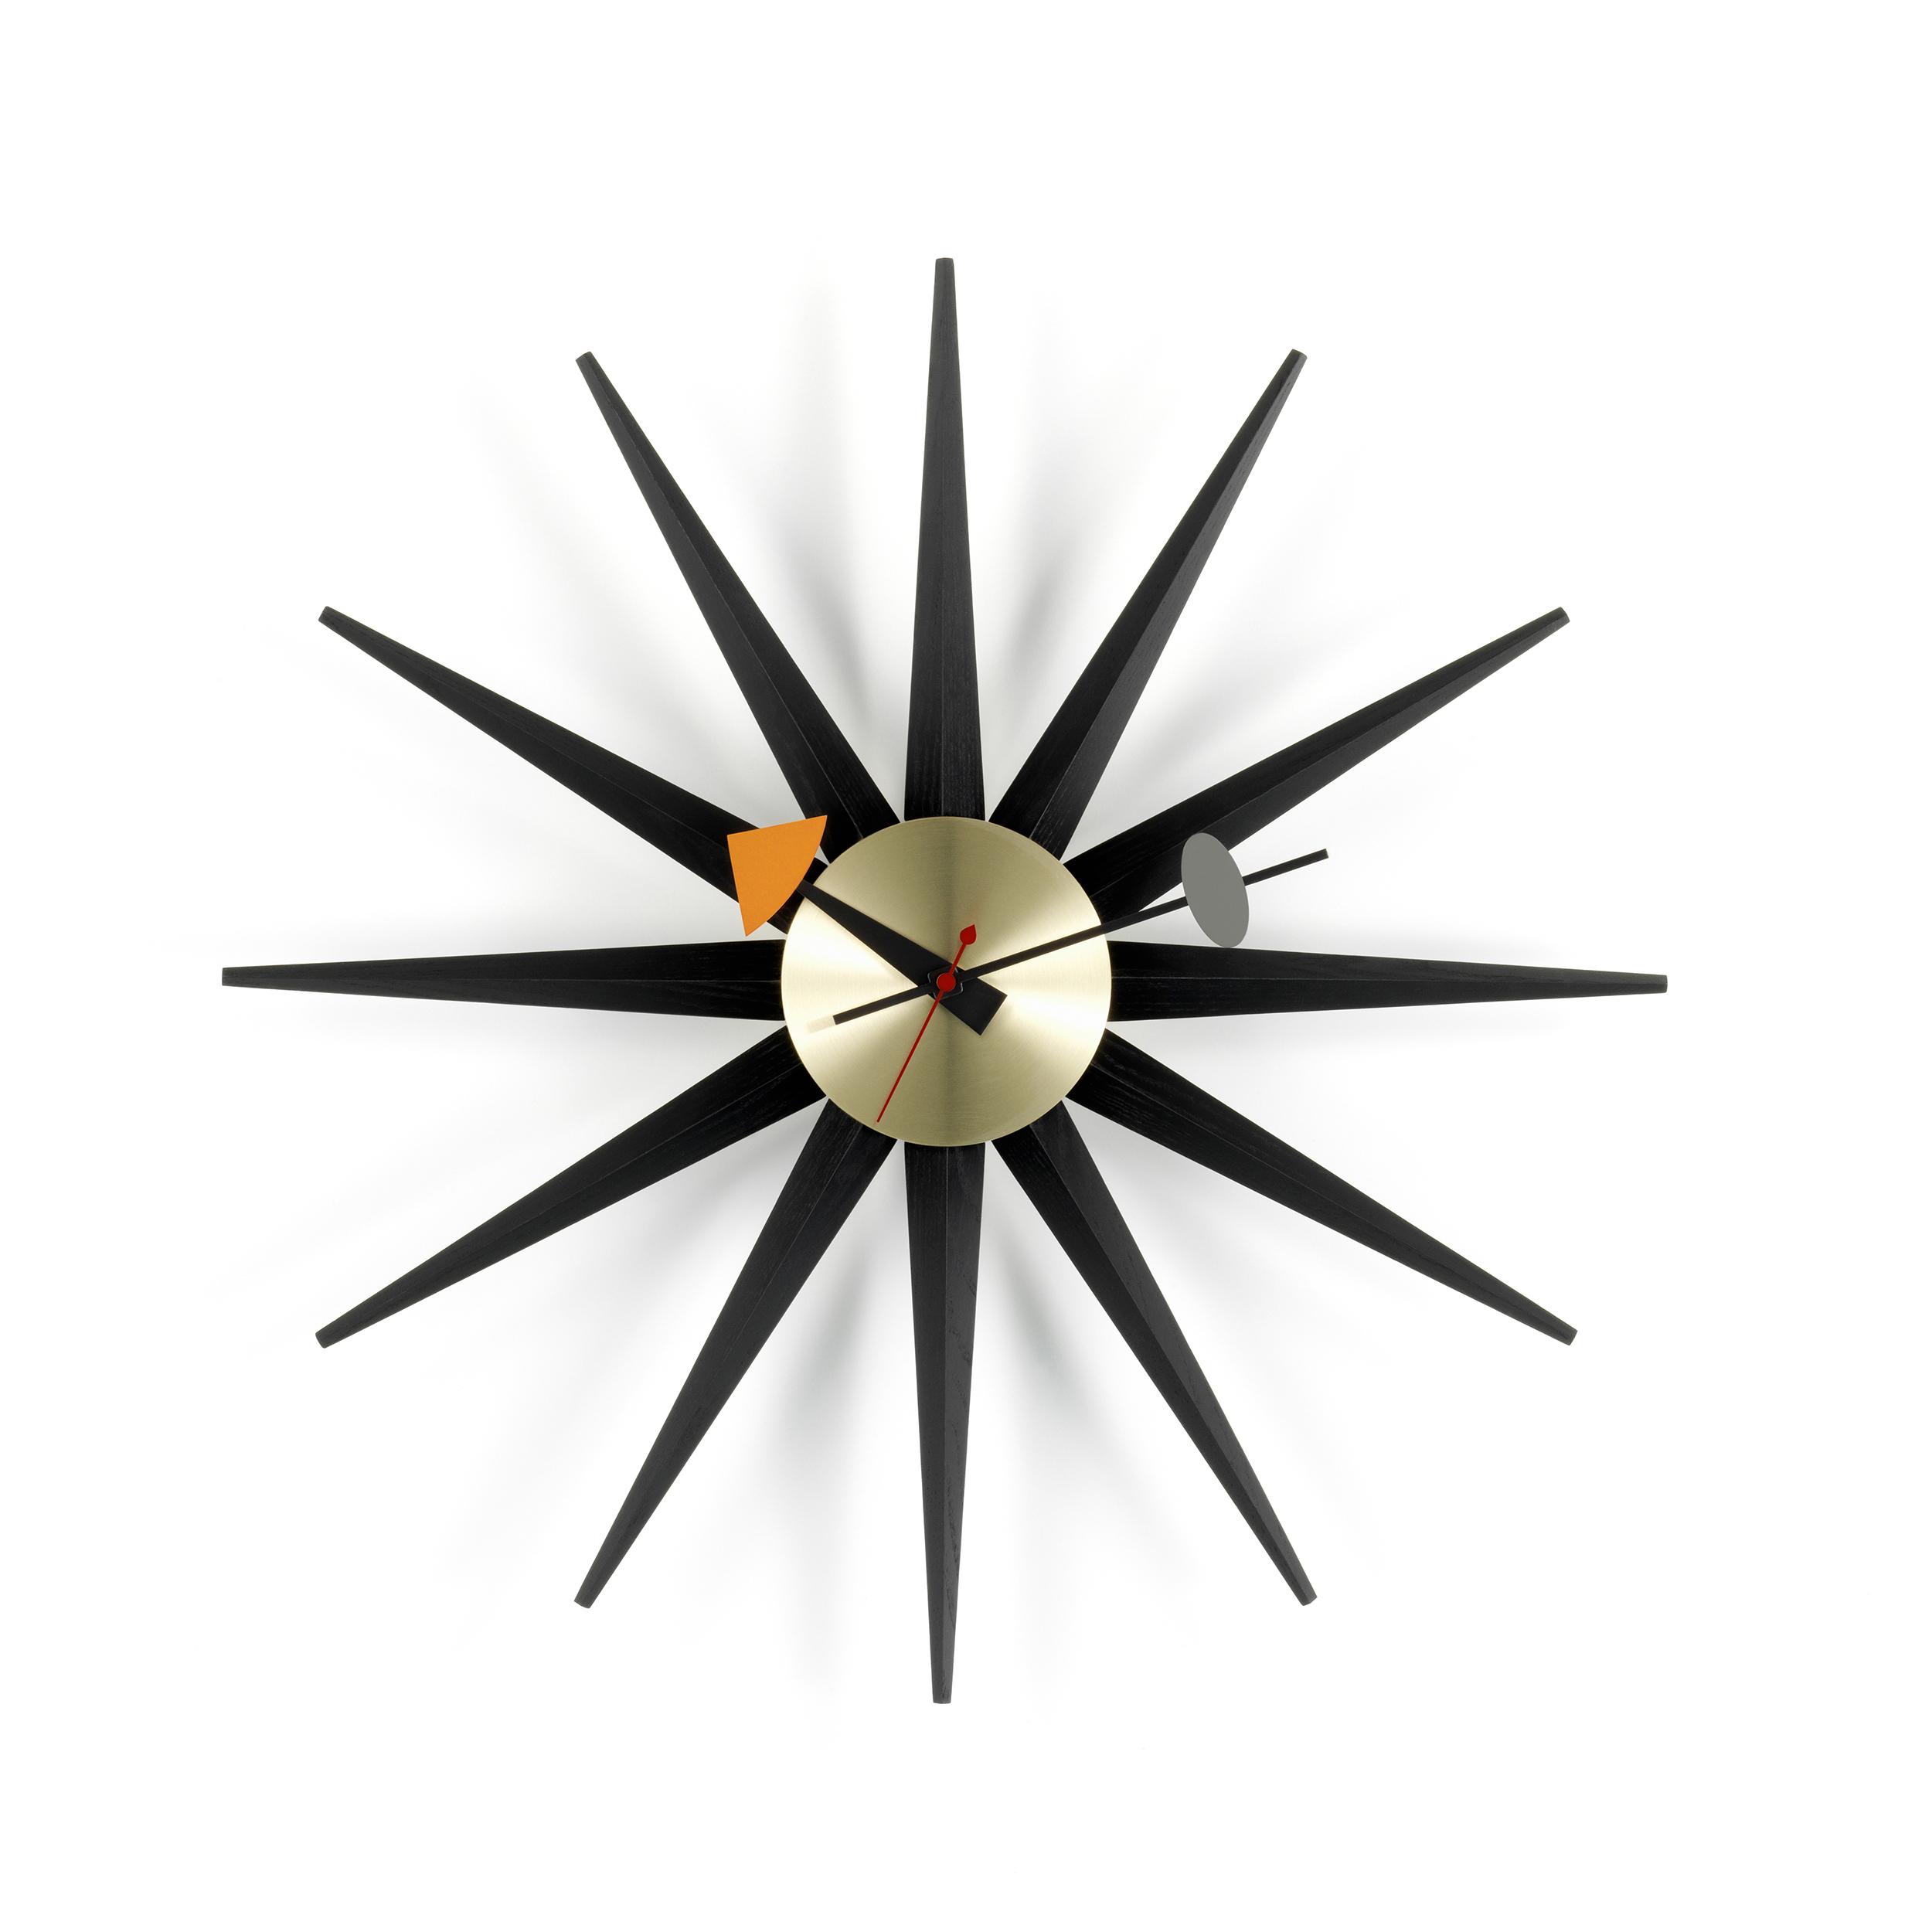 Name : Sunburst Clock